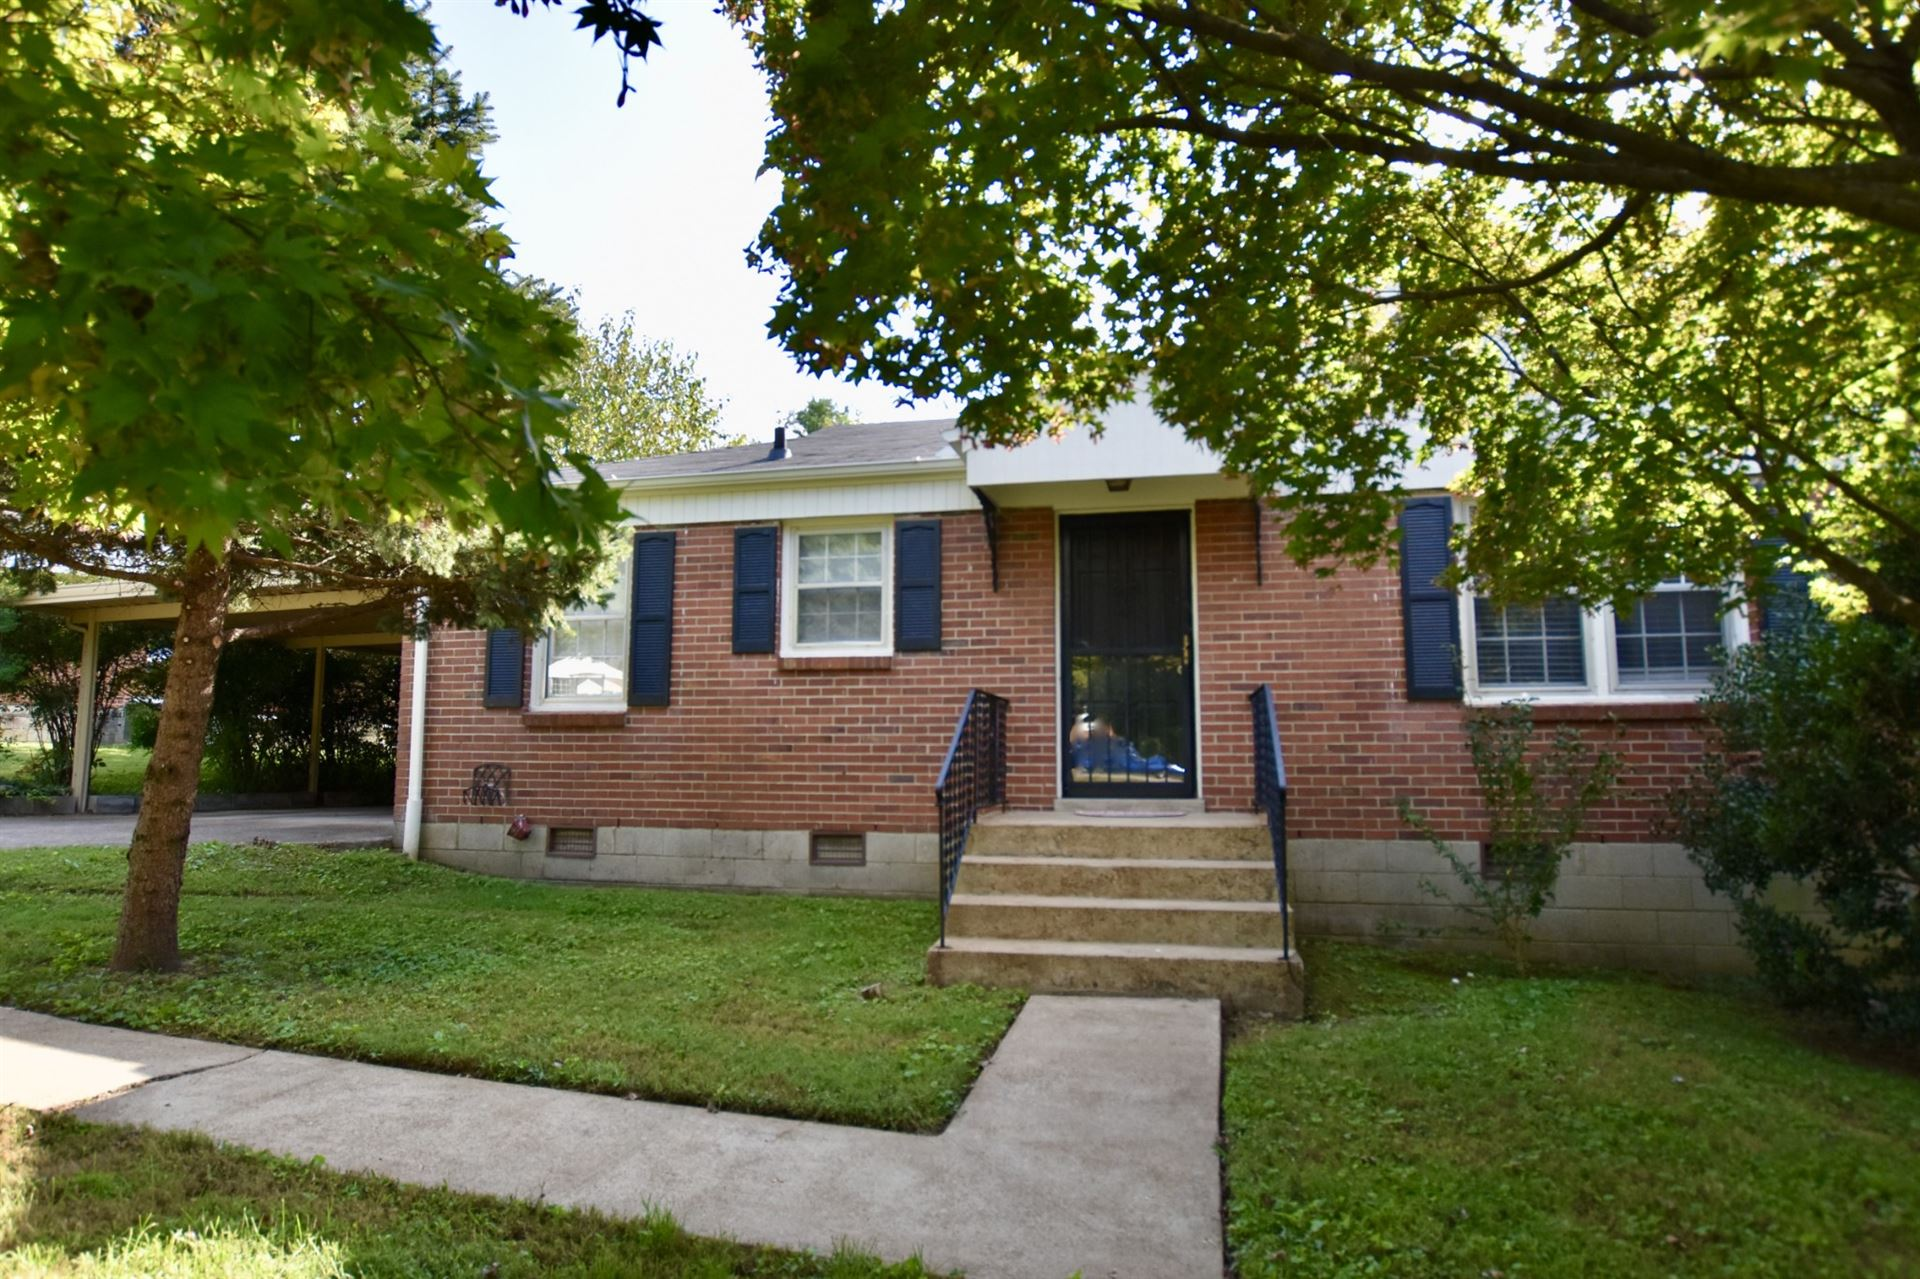 2803 Saint Edwards Dr, Nashville, TN 37211 - MLS#: 2193935